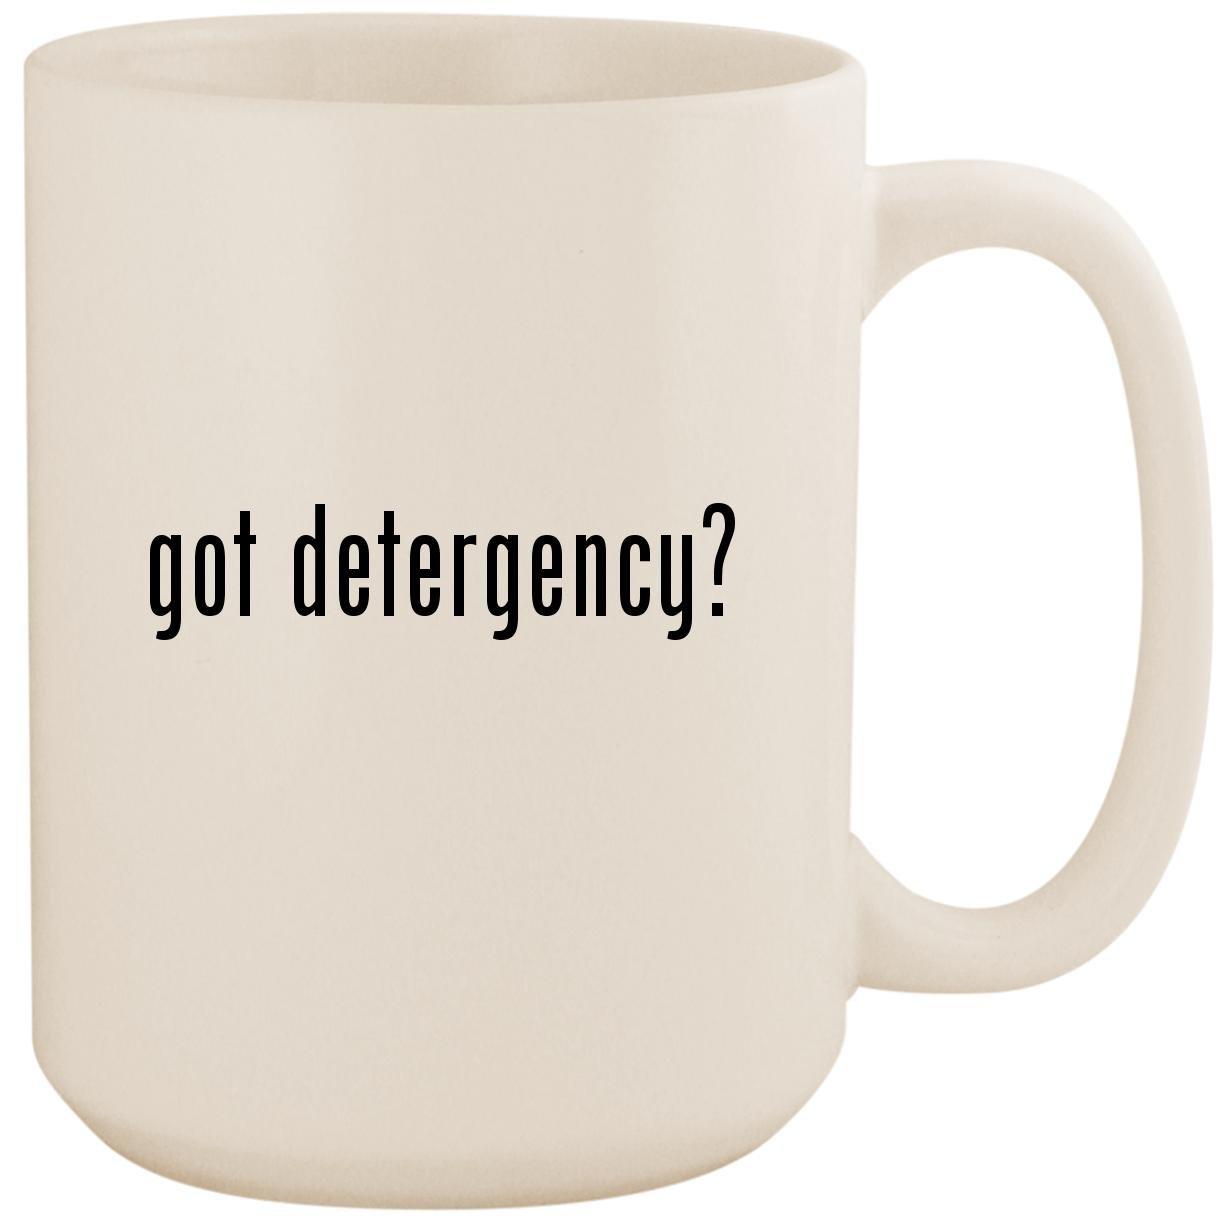 got detergency? - White 15oz Ceramic Coffee Mug Cup